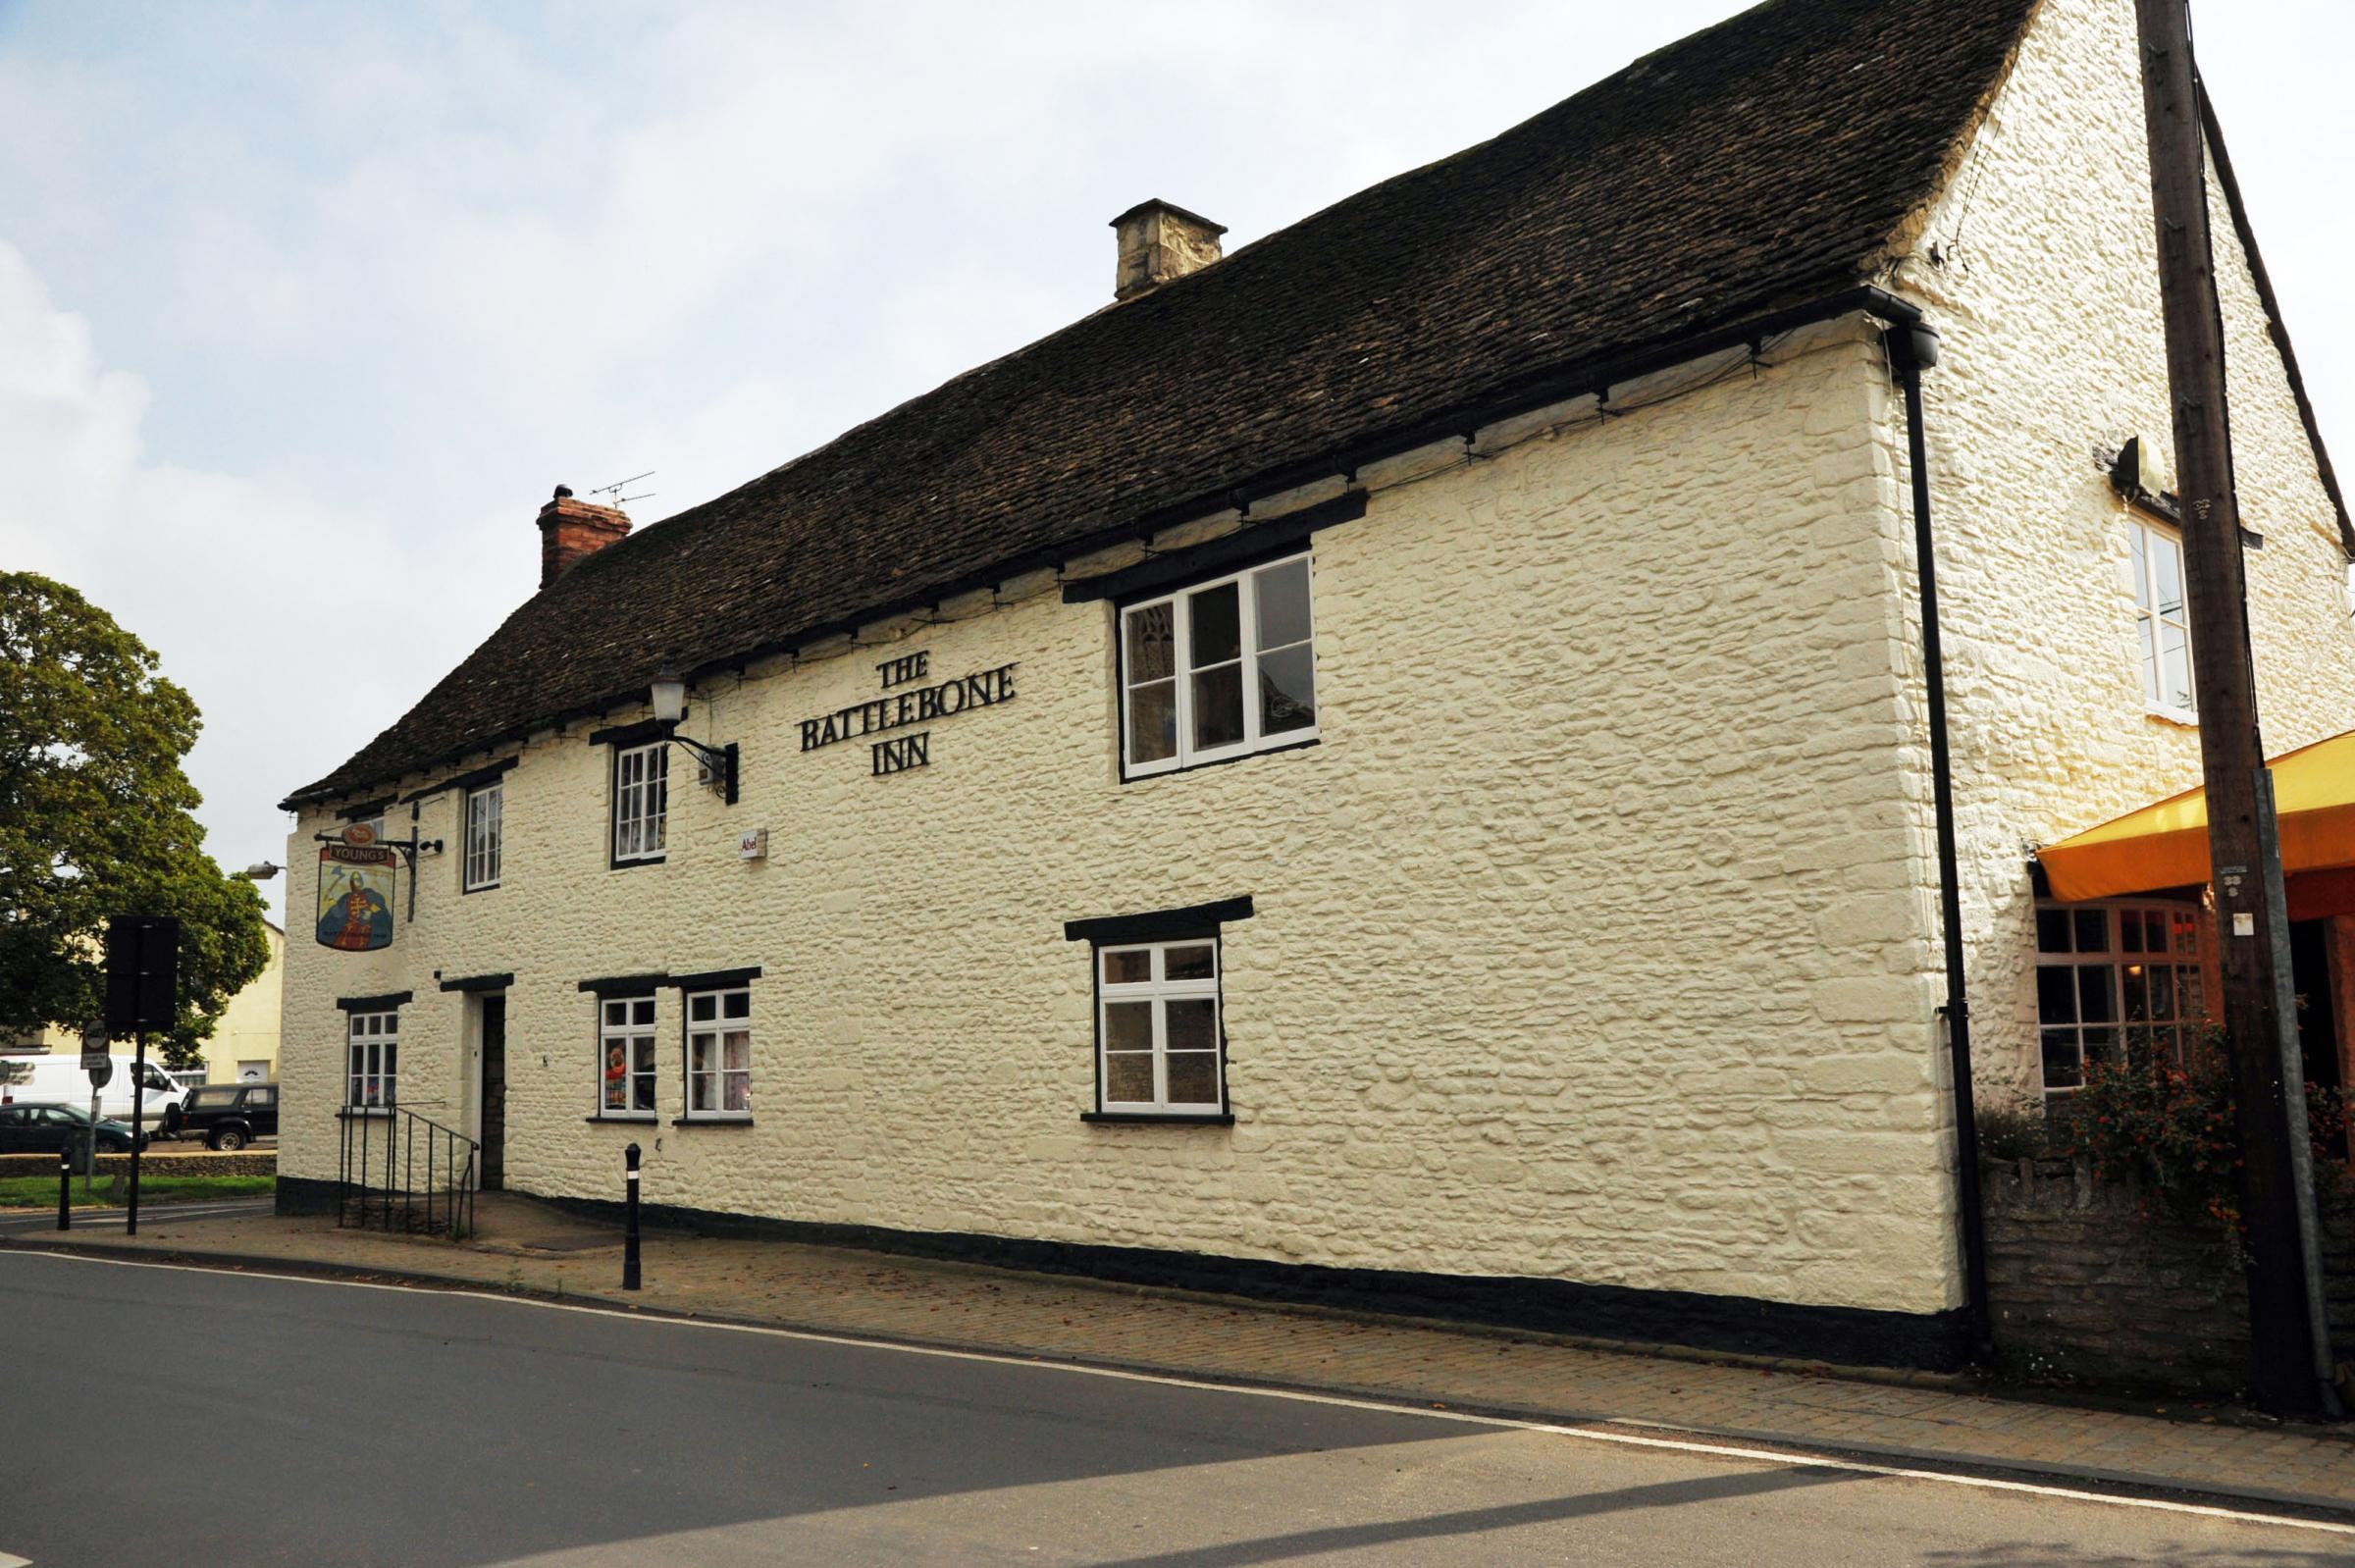 Rattlebone Inn at Sherston